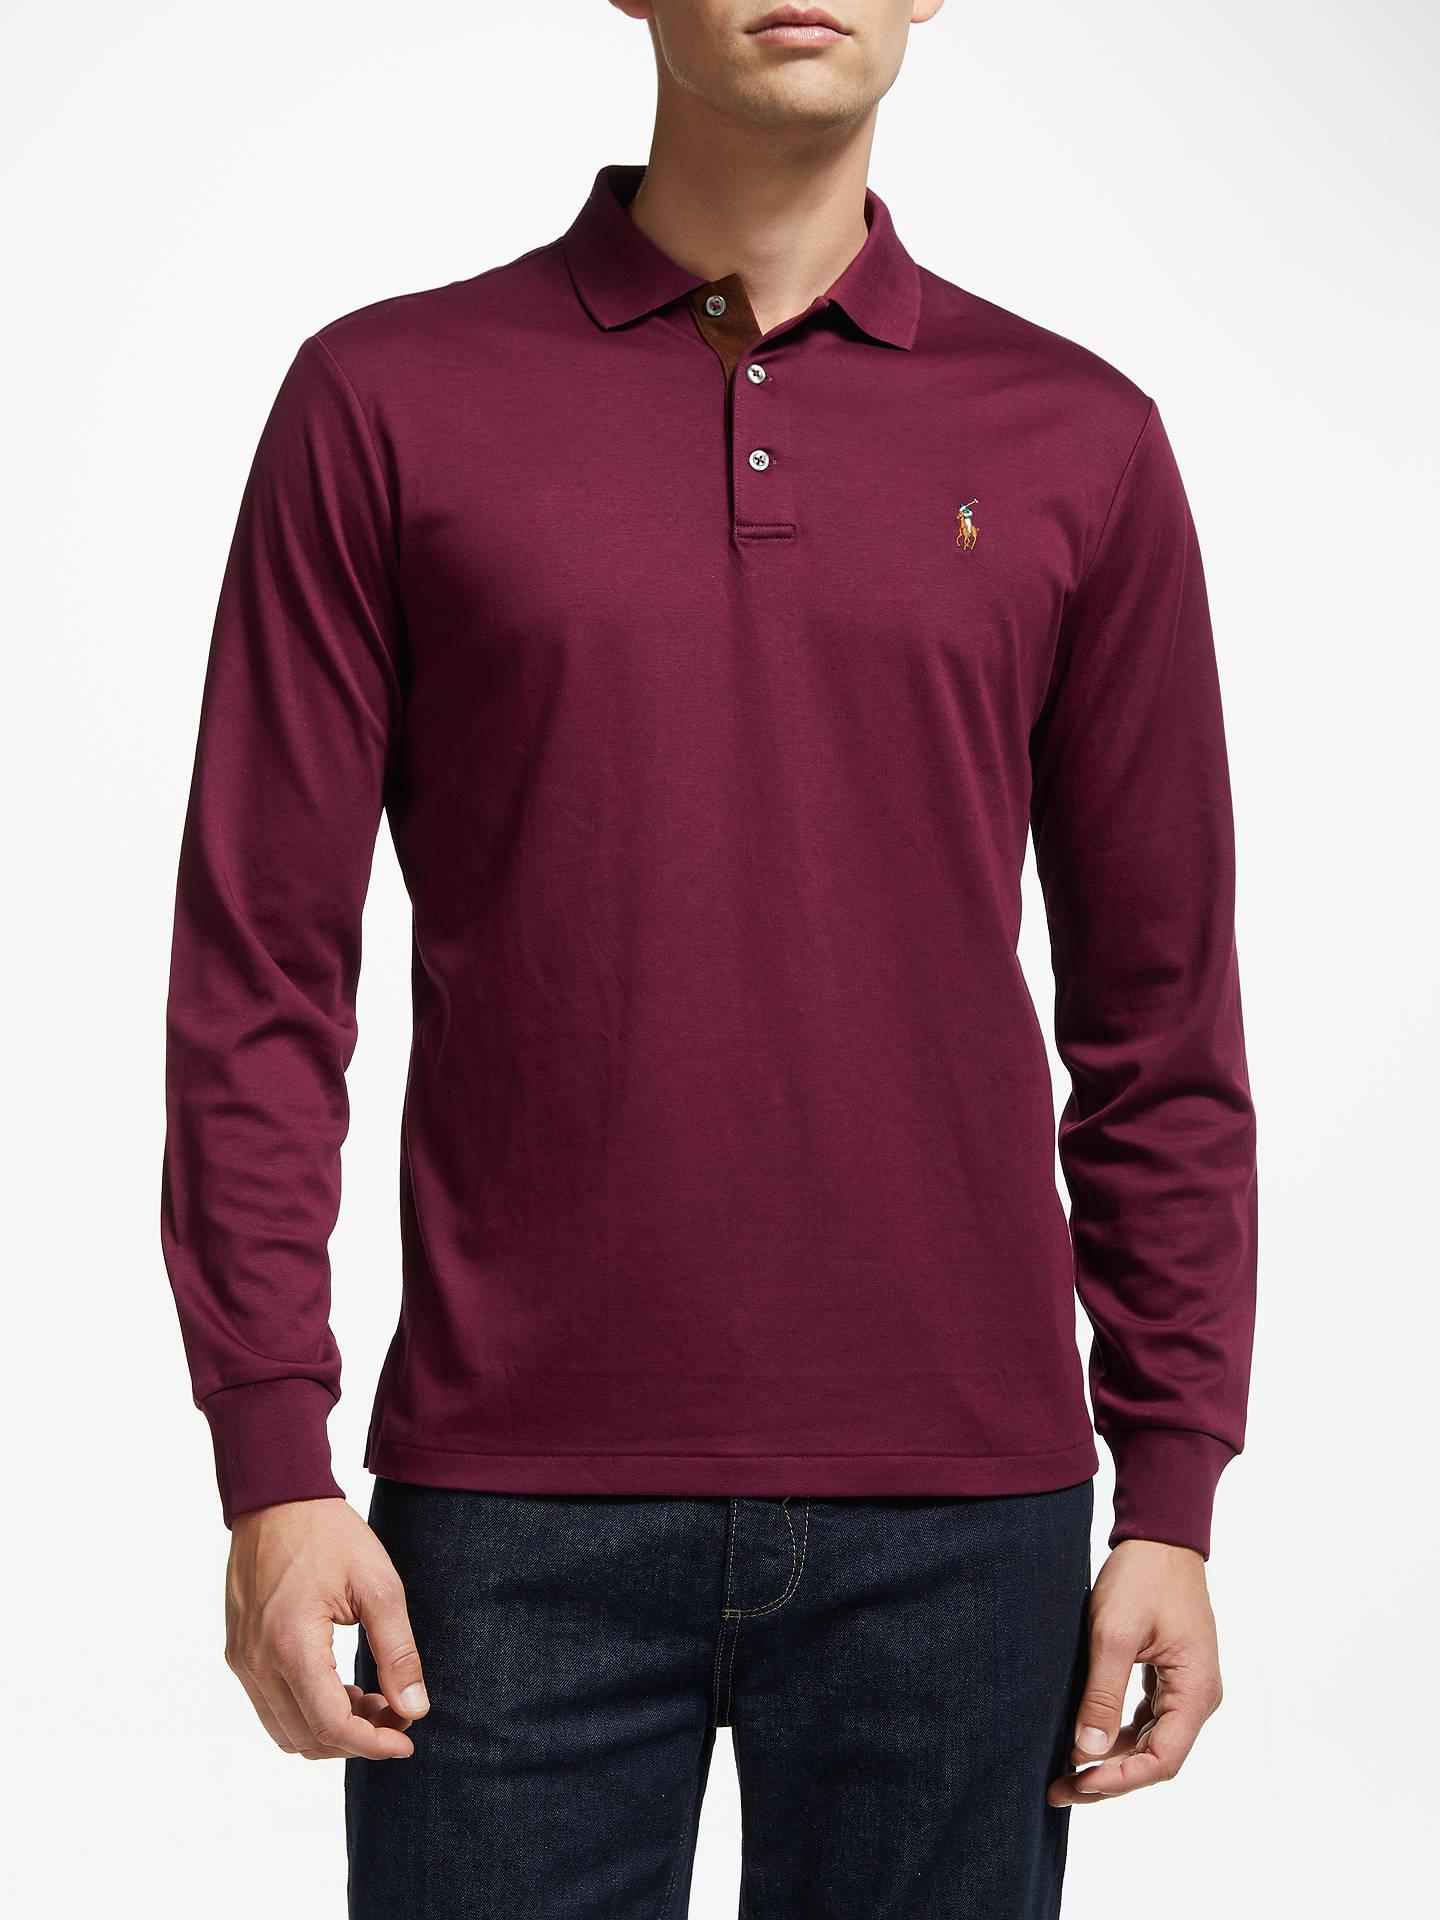 1456ebe6 Buy Polo Ralph Lauren Pima Cotton Slim Fit Polo Shirt, Classic Wine, XL  Online ...